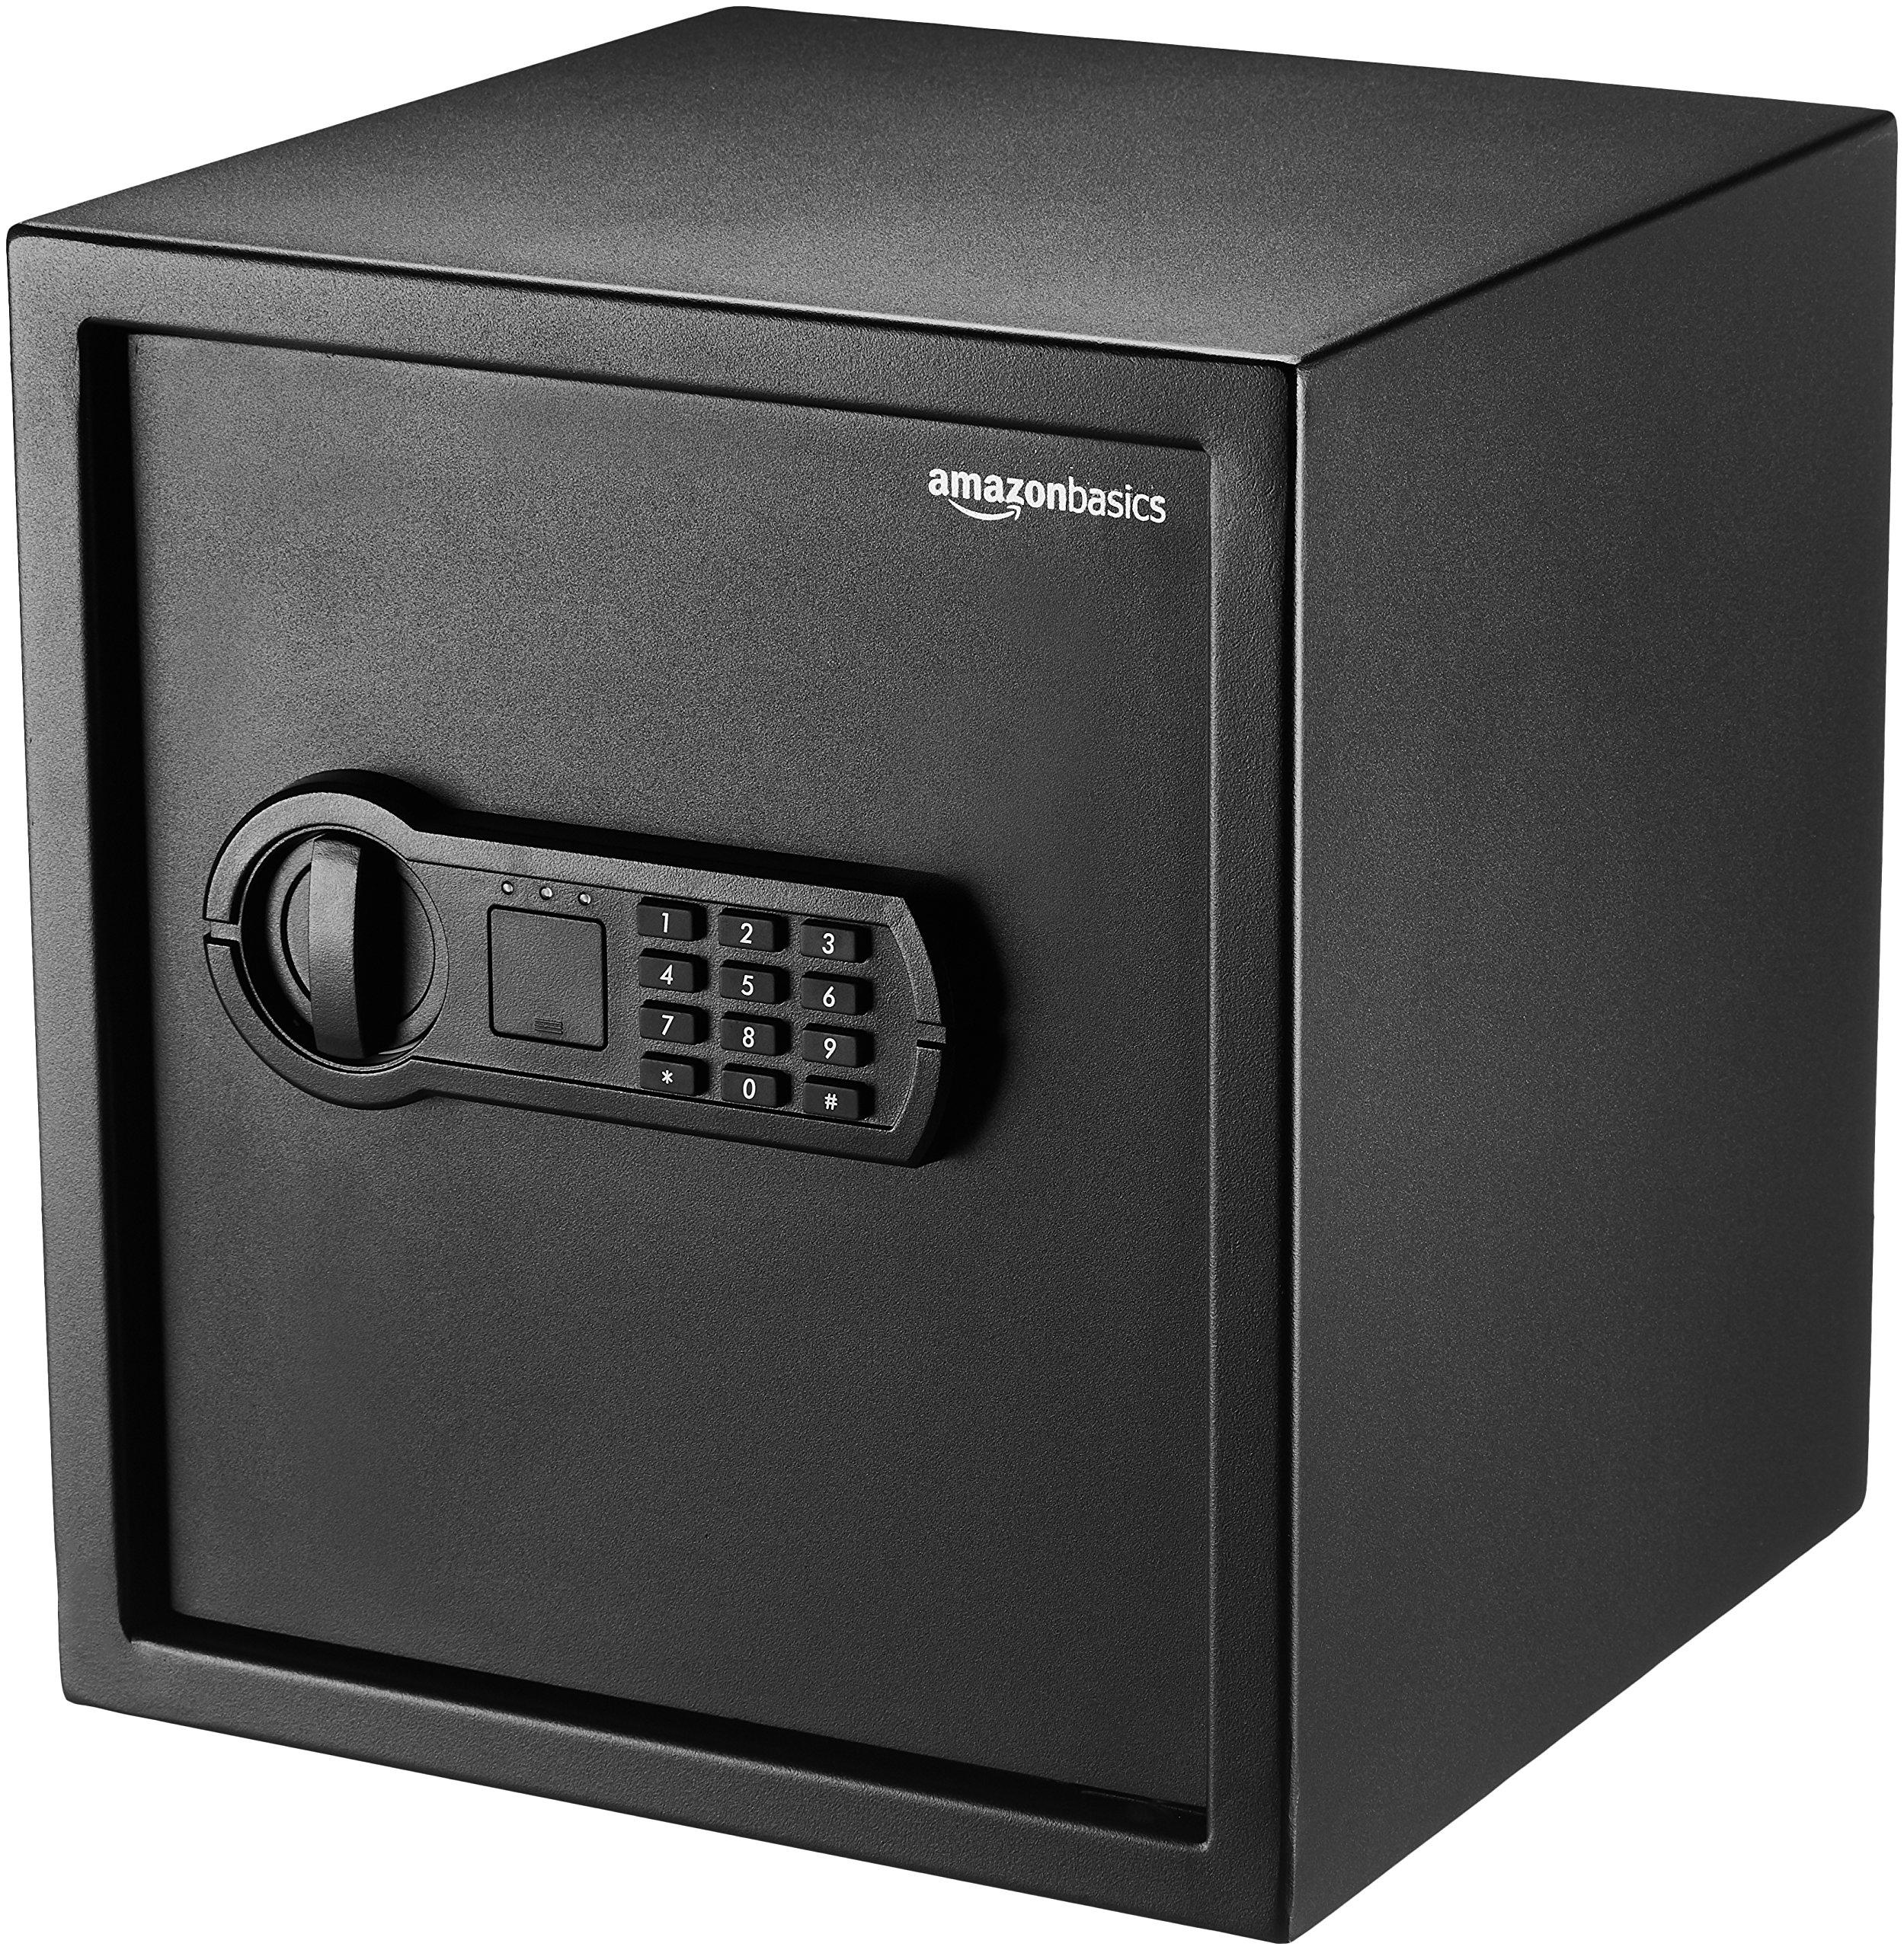 Amazon Basics Home Keypad Safe - 1.2 Cubic Feet, 13 x 13 x 14.2 Inches, Black - 36SAM